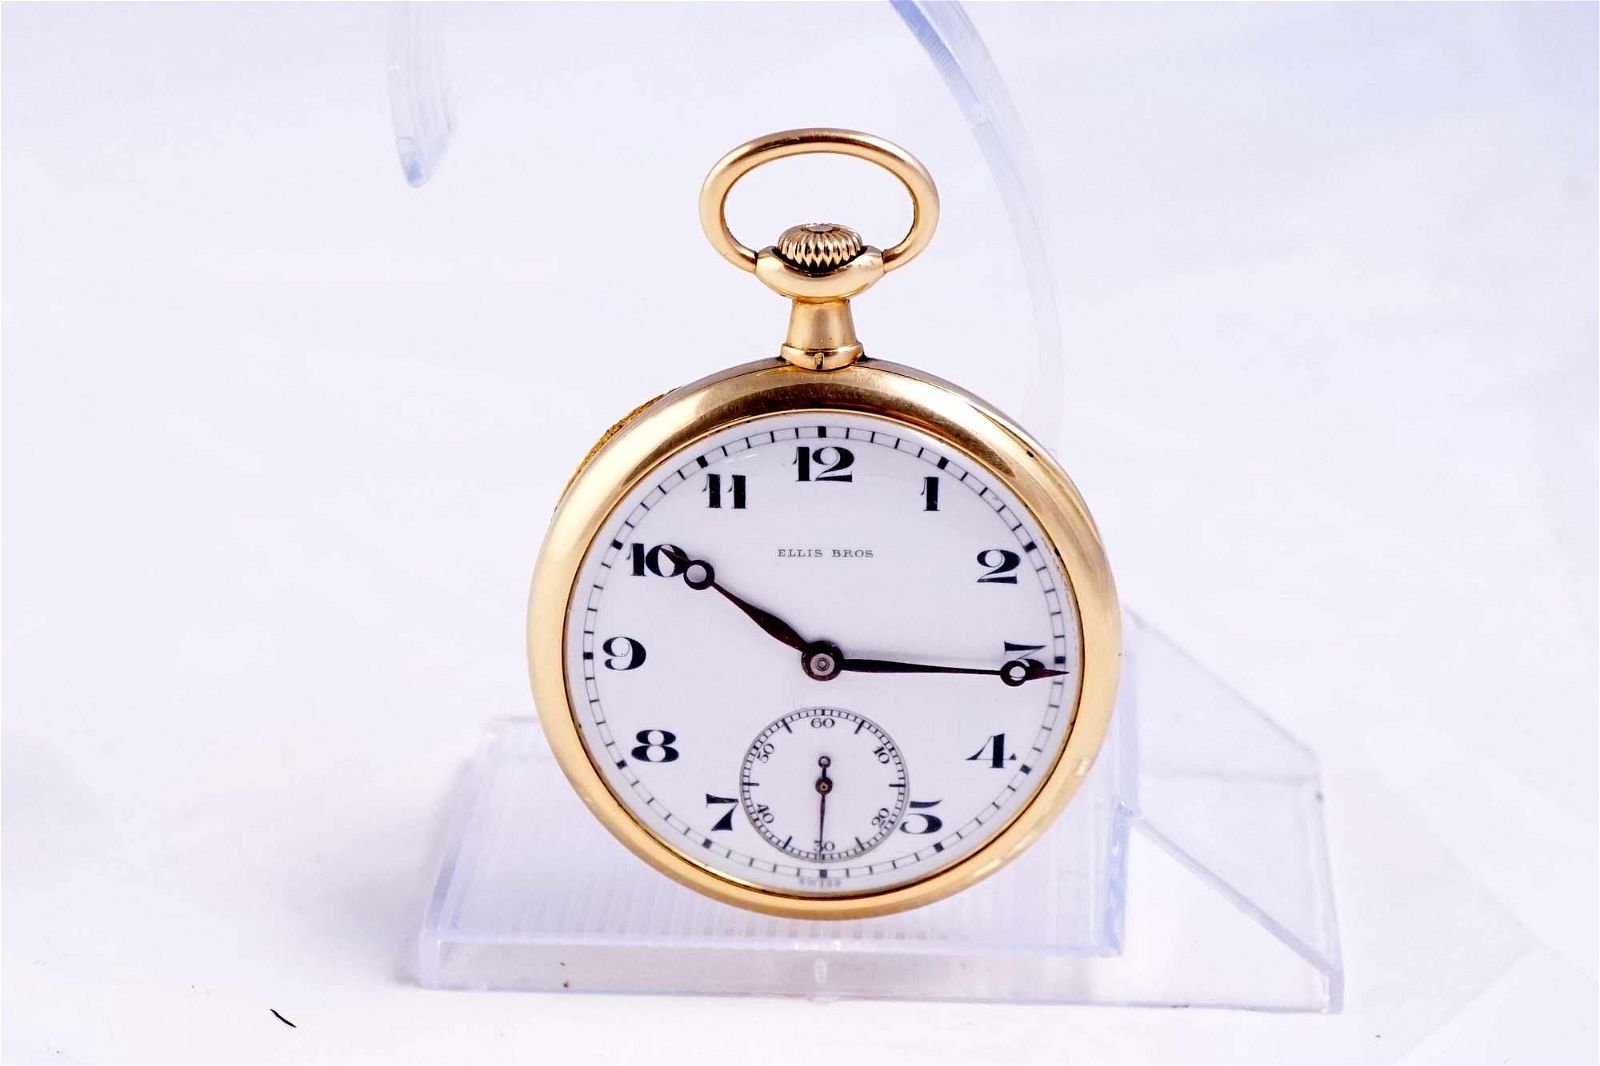 Vacheron Constantin - 14K gold pocket watch - 1920